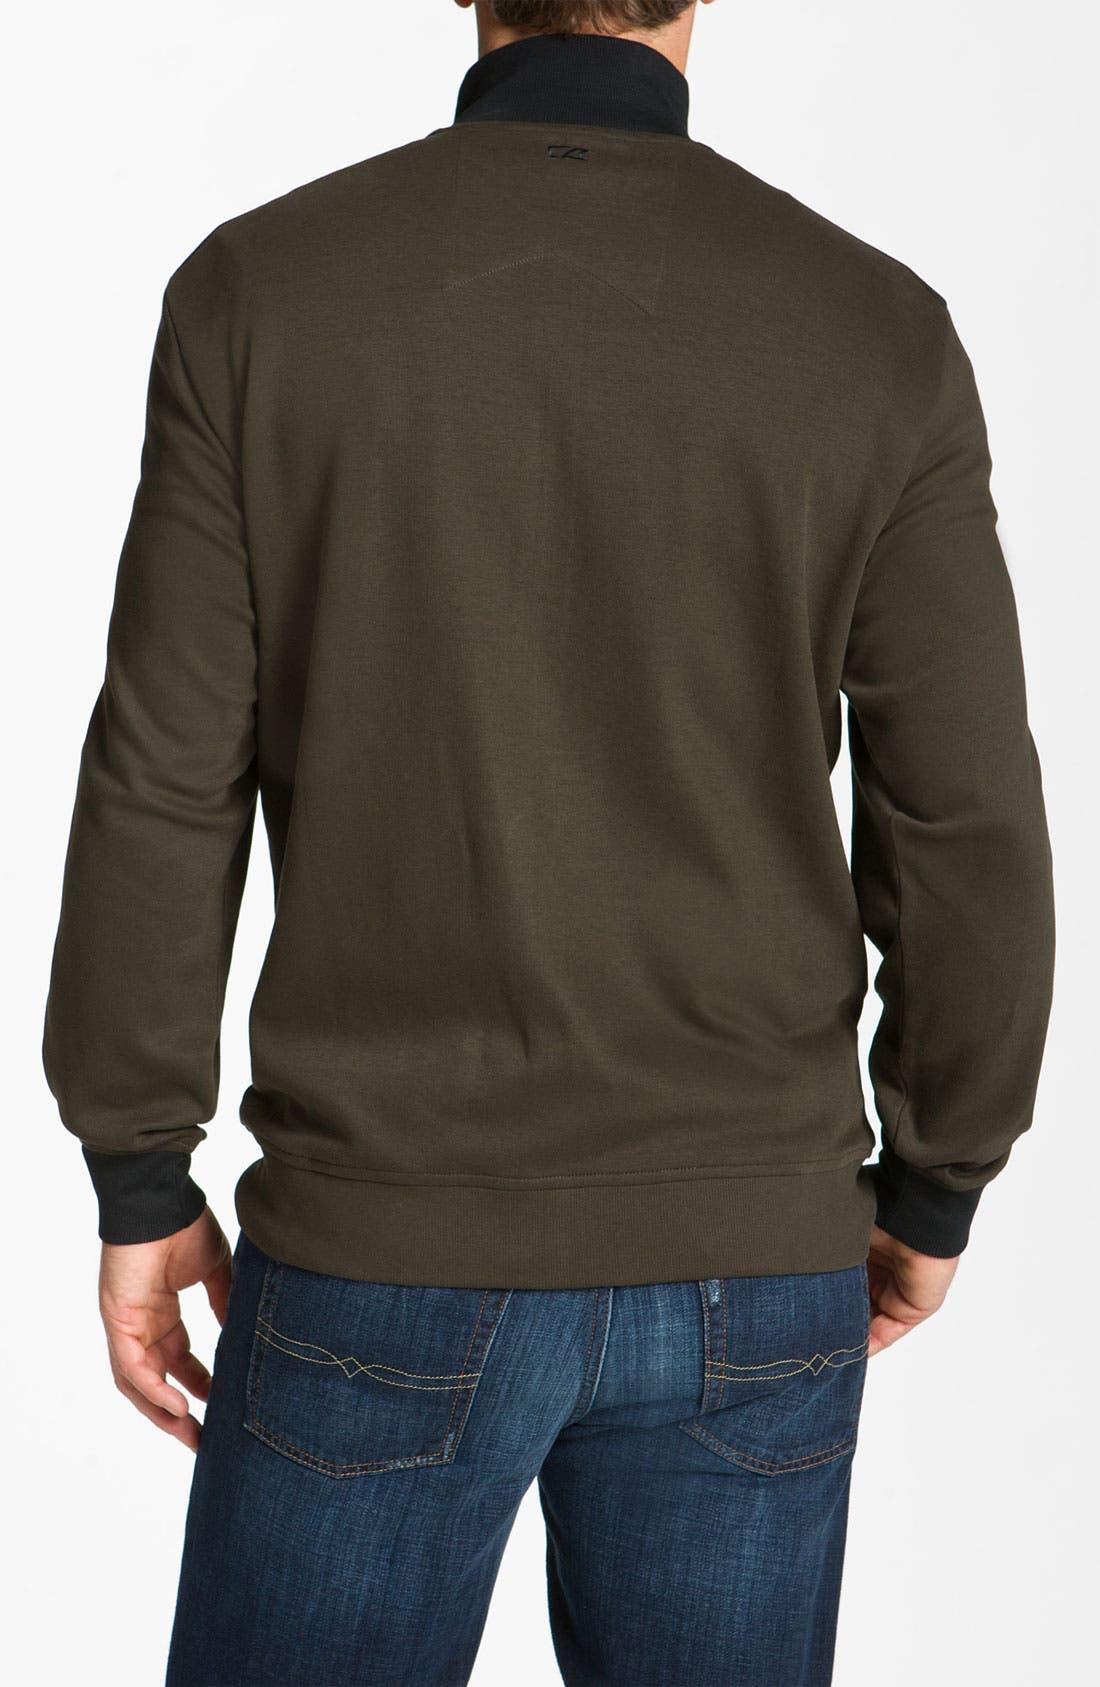 Alternate Image 2  - Cutter & Buck 'Waterbrook' Jacket (Big & Tall) (Online Exclusive)